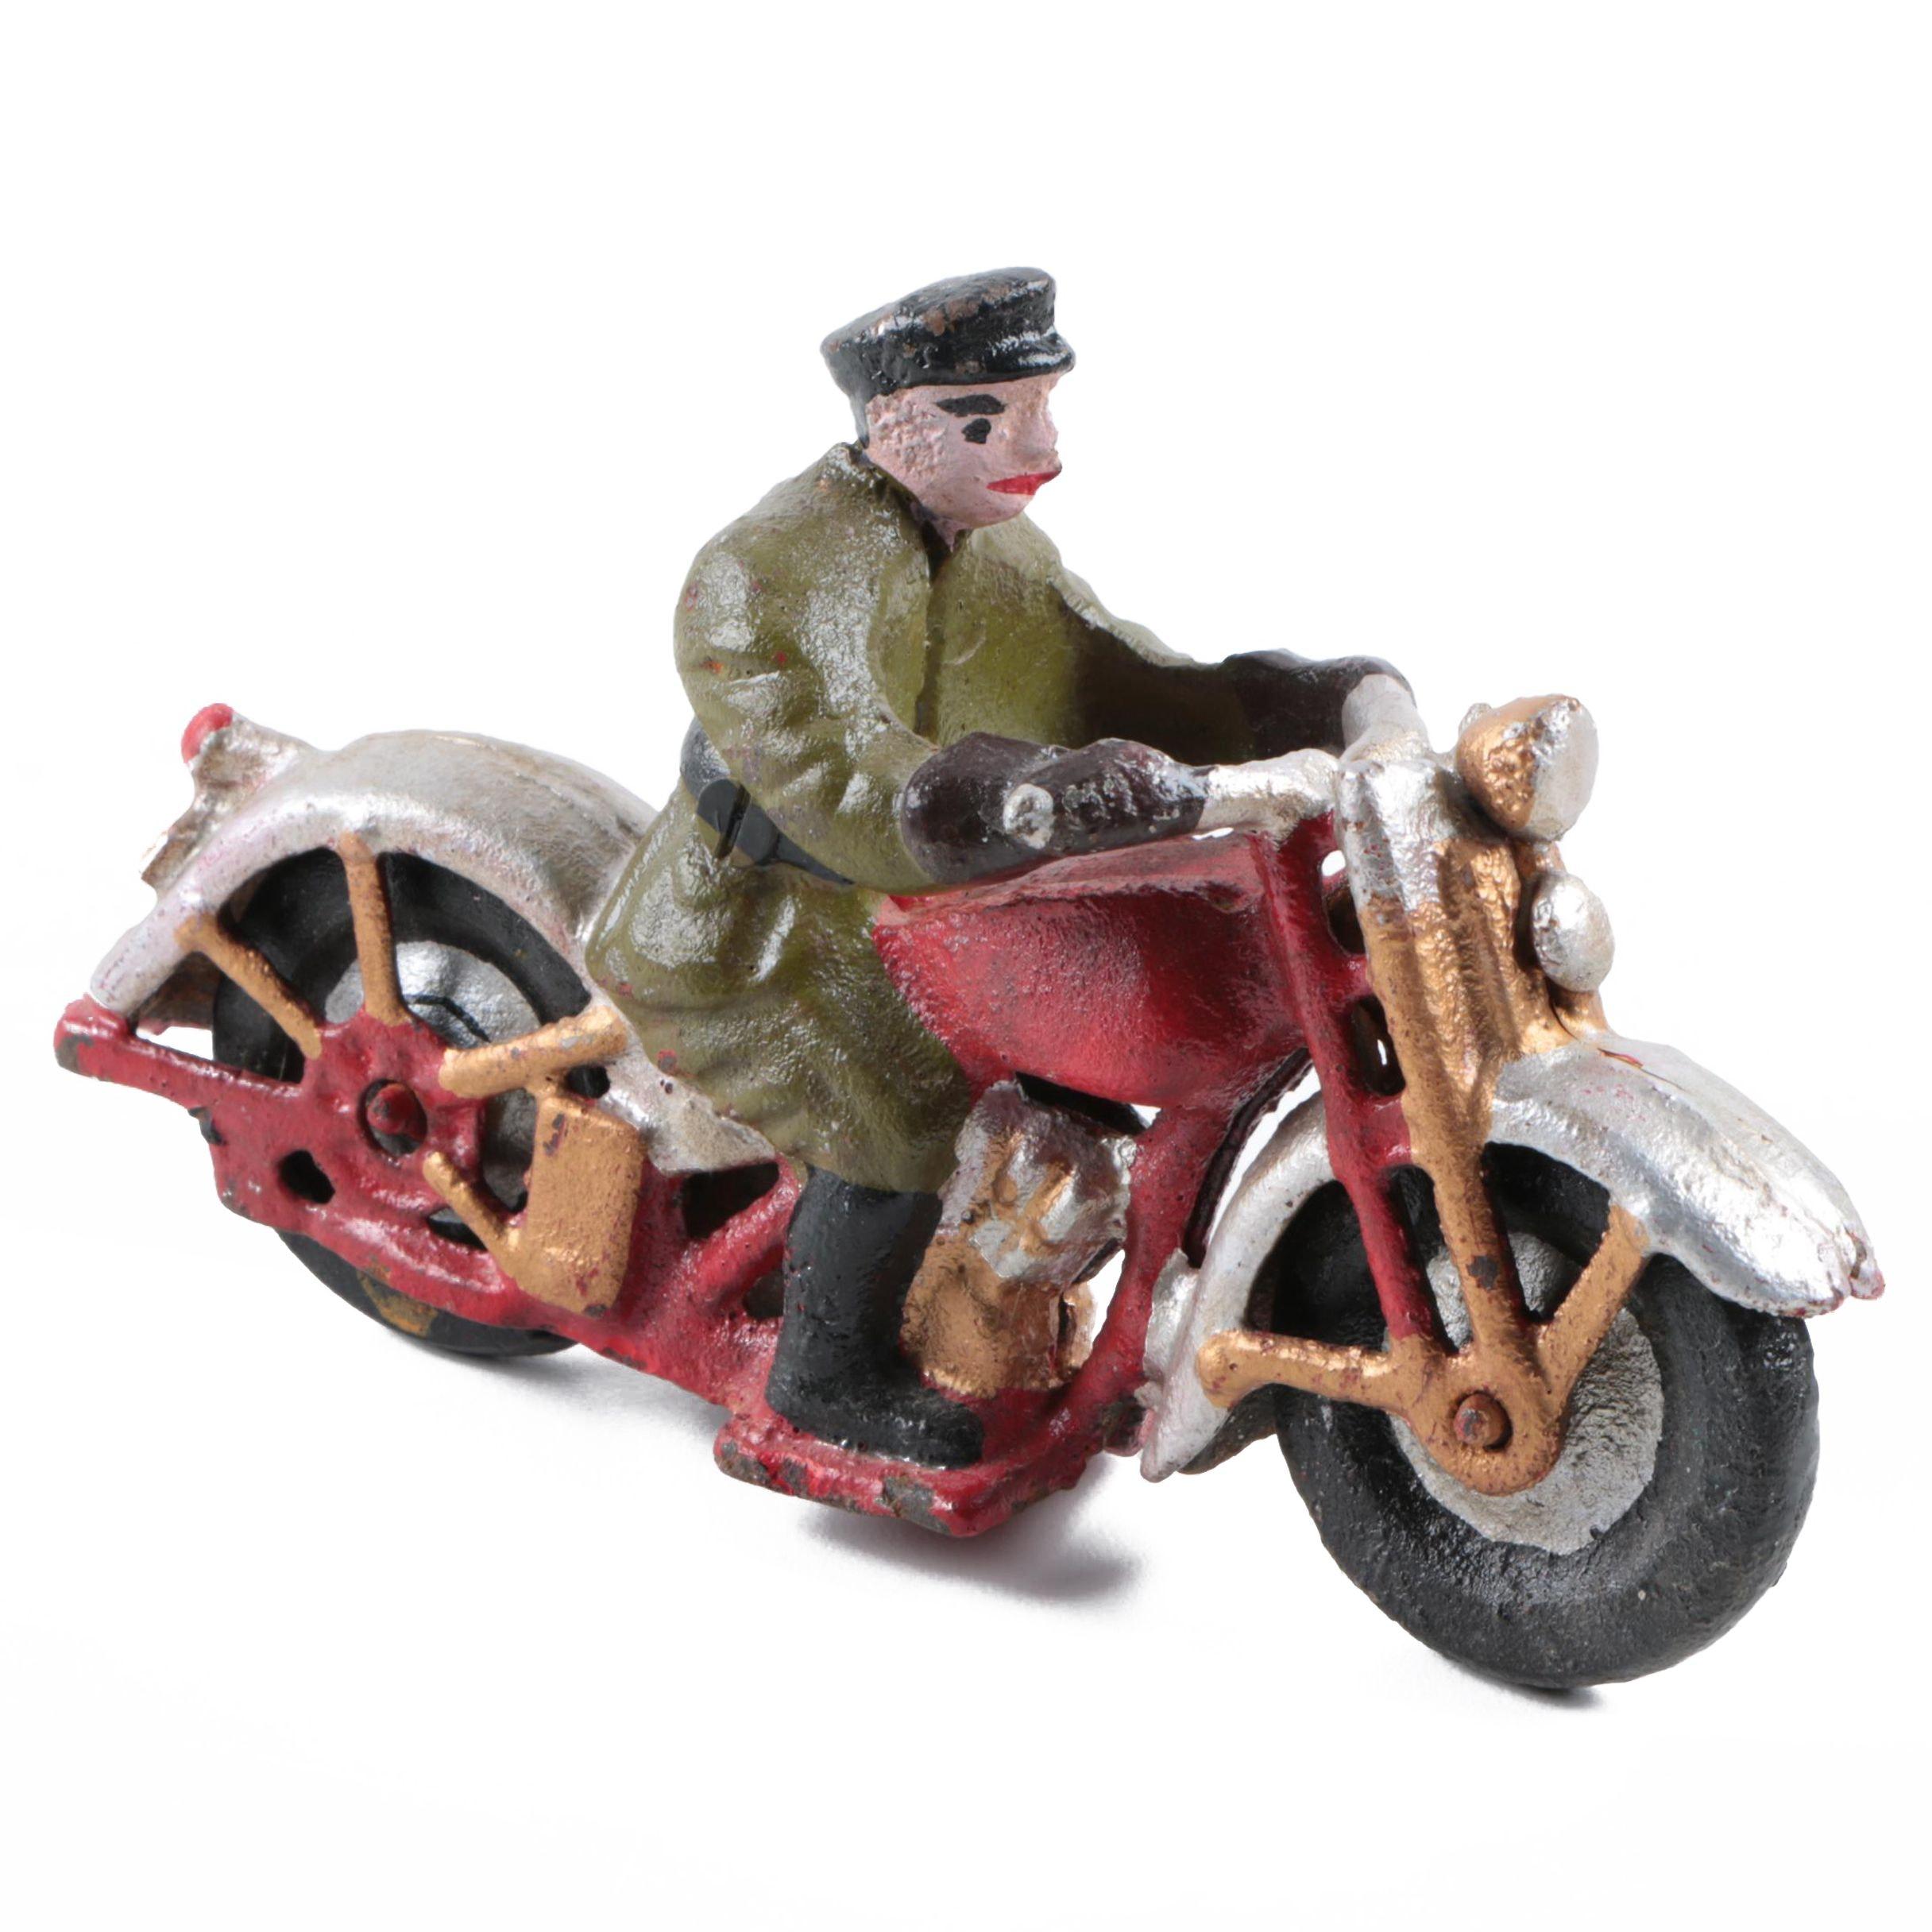 Cast Iron Motorcyclist Figurine